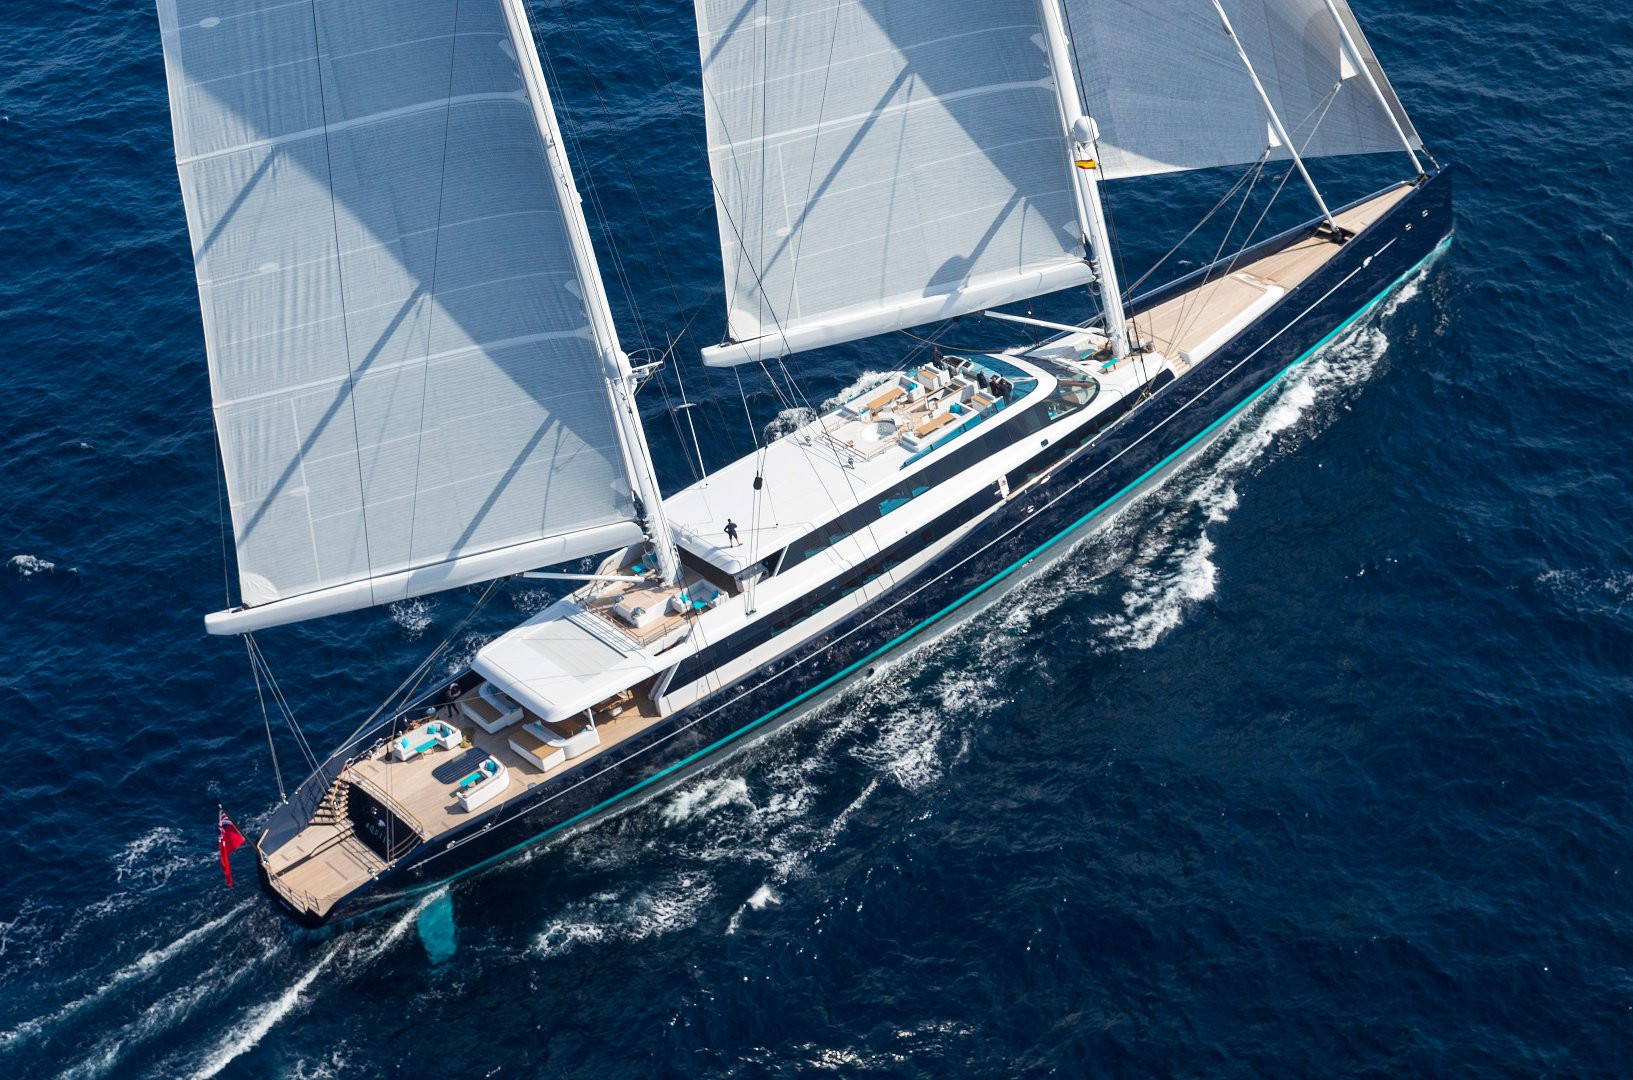 Yacht AQUIJO - on charter, sailing